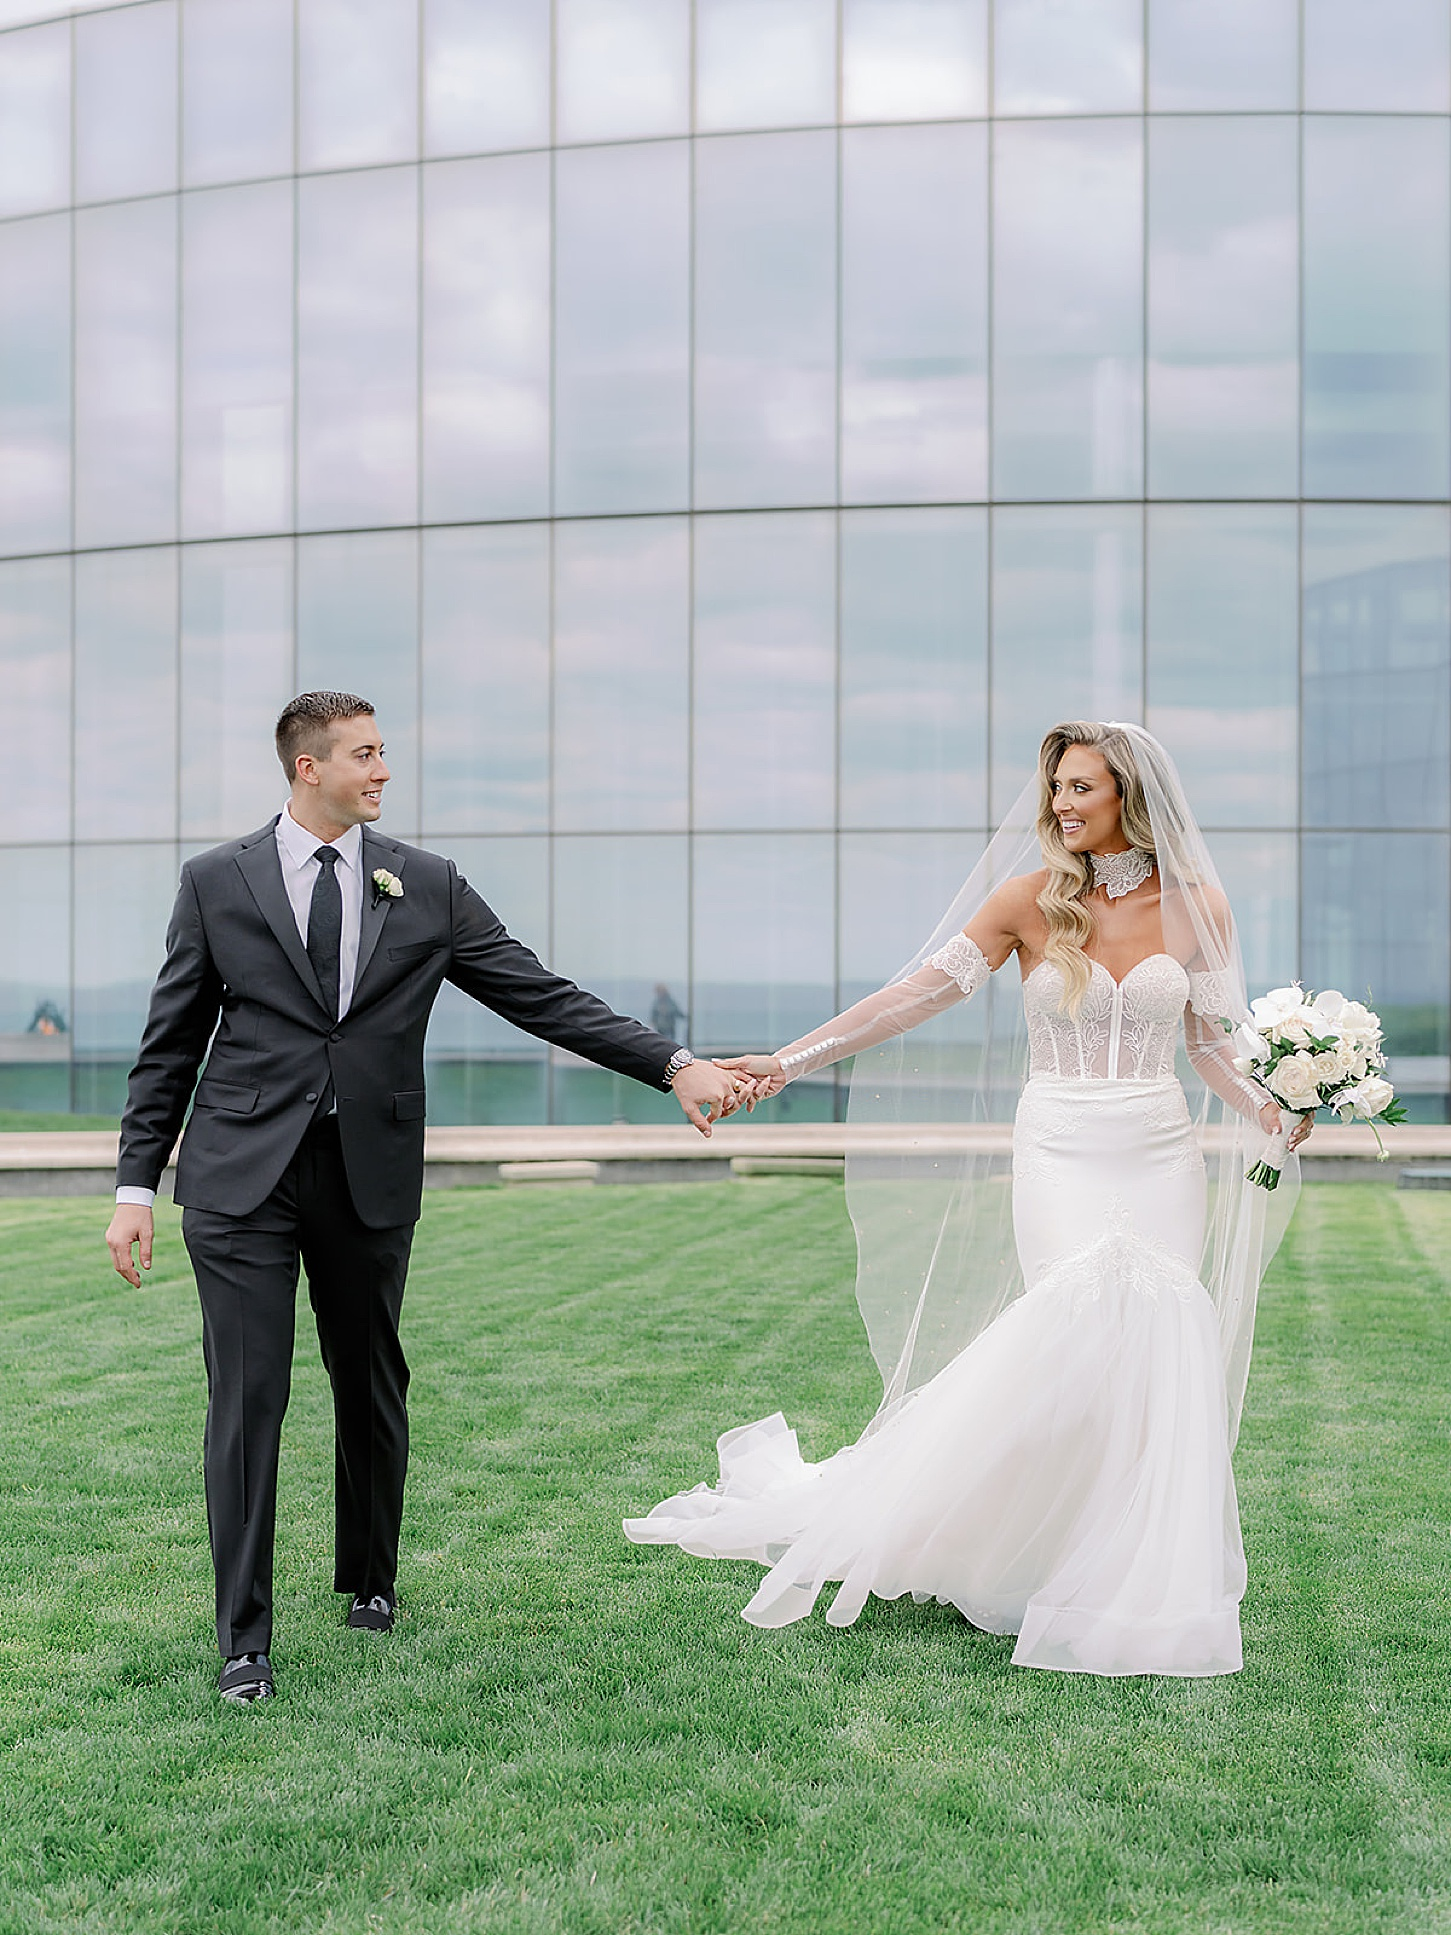 Atlantic City Wedding Photography Studio by Magdalena Studios Lexy Cha 0071